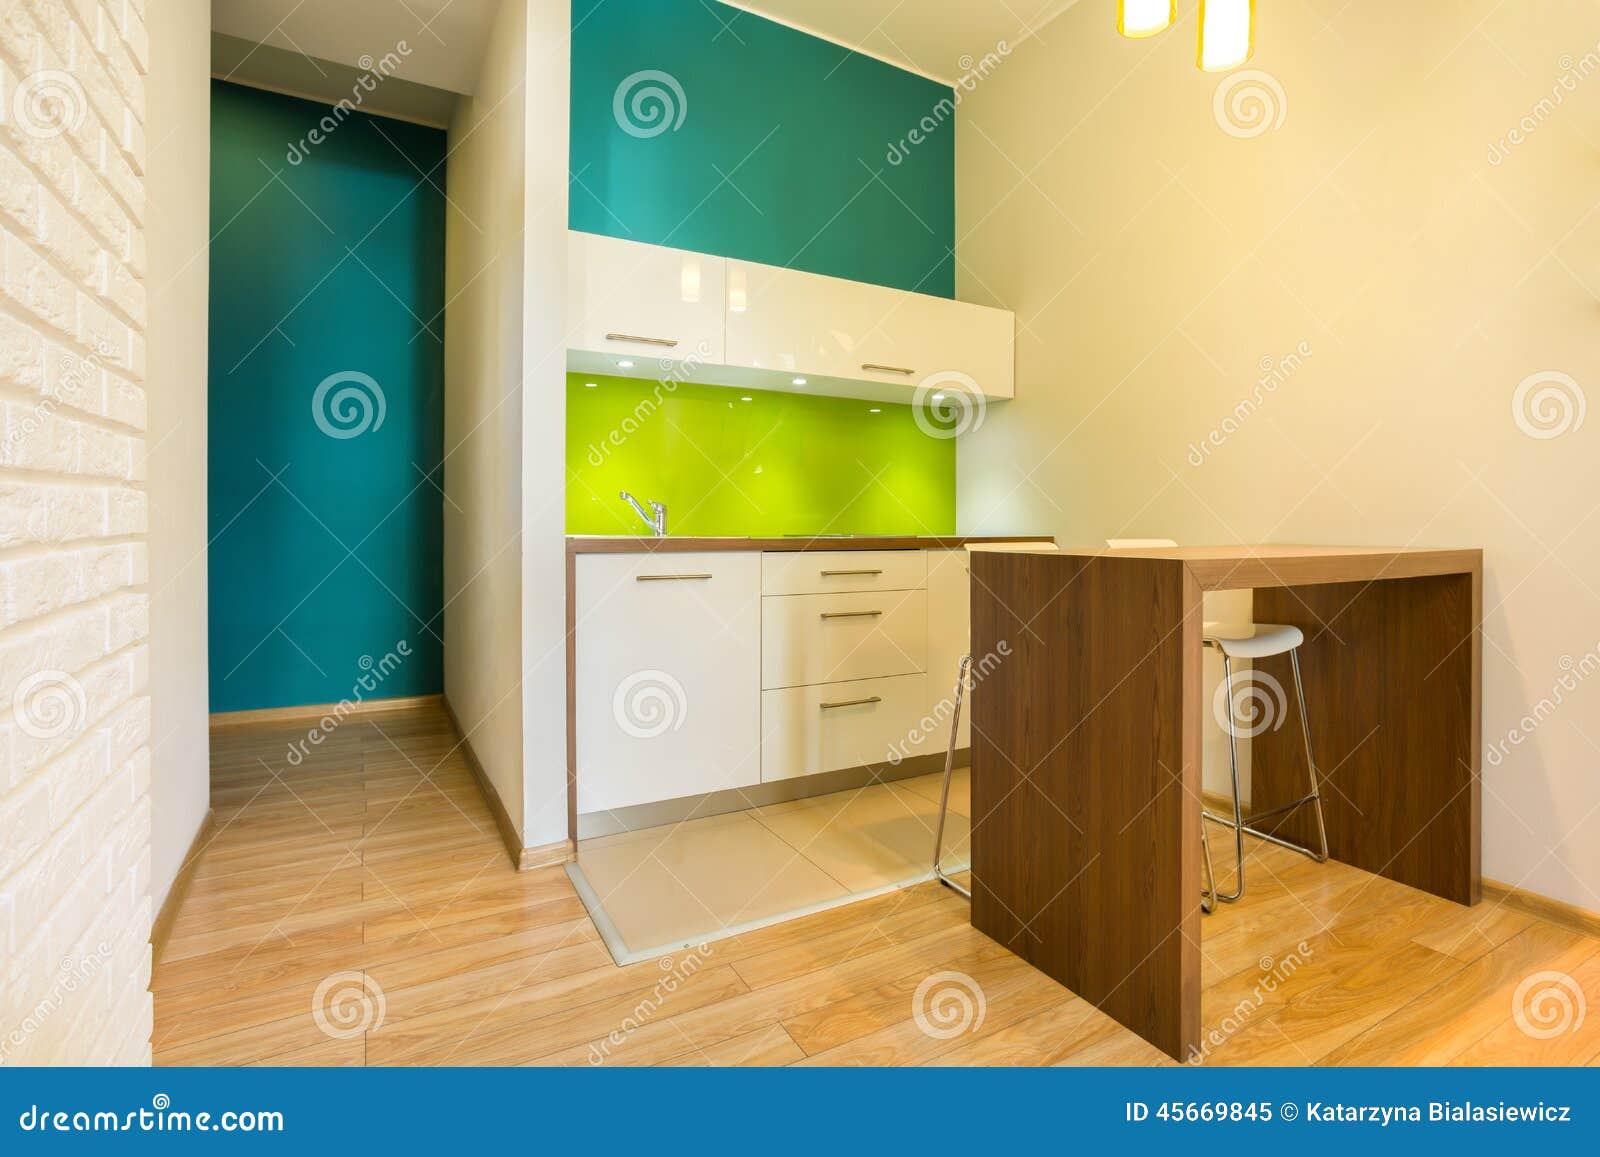 Kleine compacte keukens kookeiland compact kleine keuken inrichten met klein - Kleine keuken met bar ...